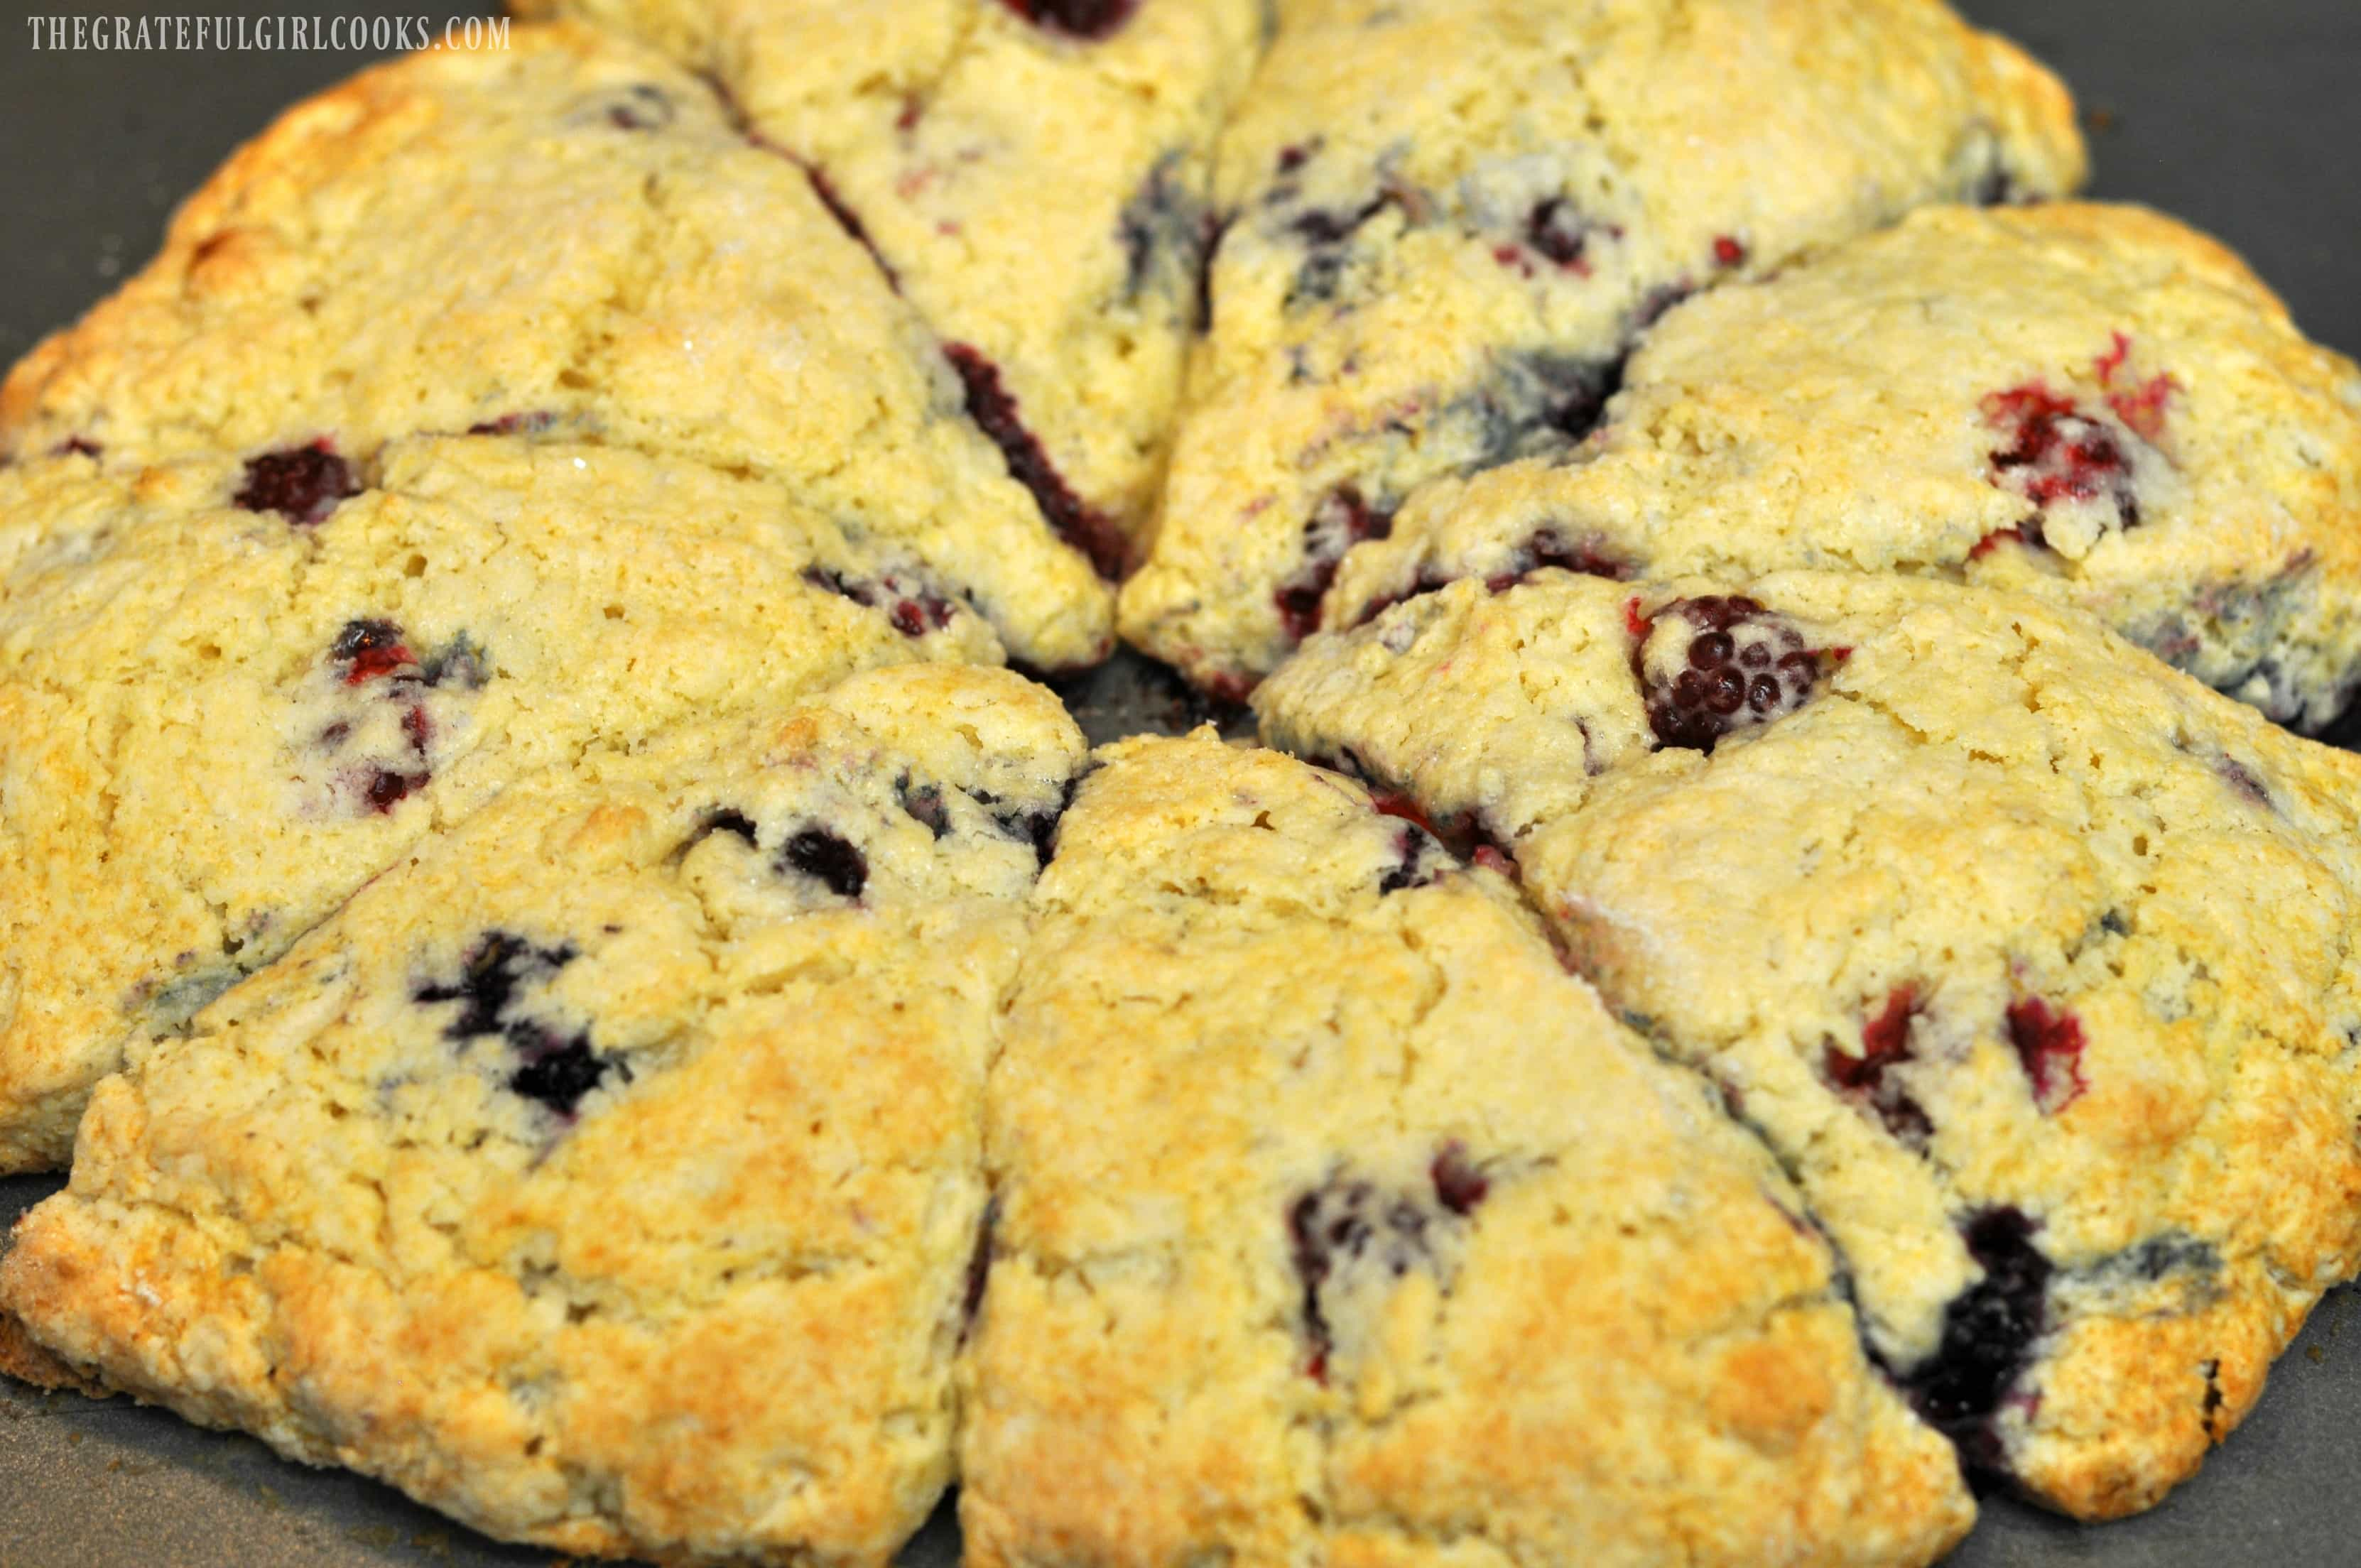 Blackberry Scones / The Grateful Girl Cooks!